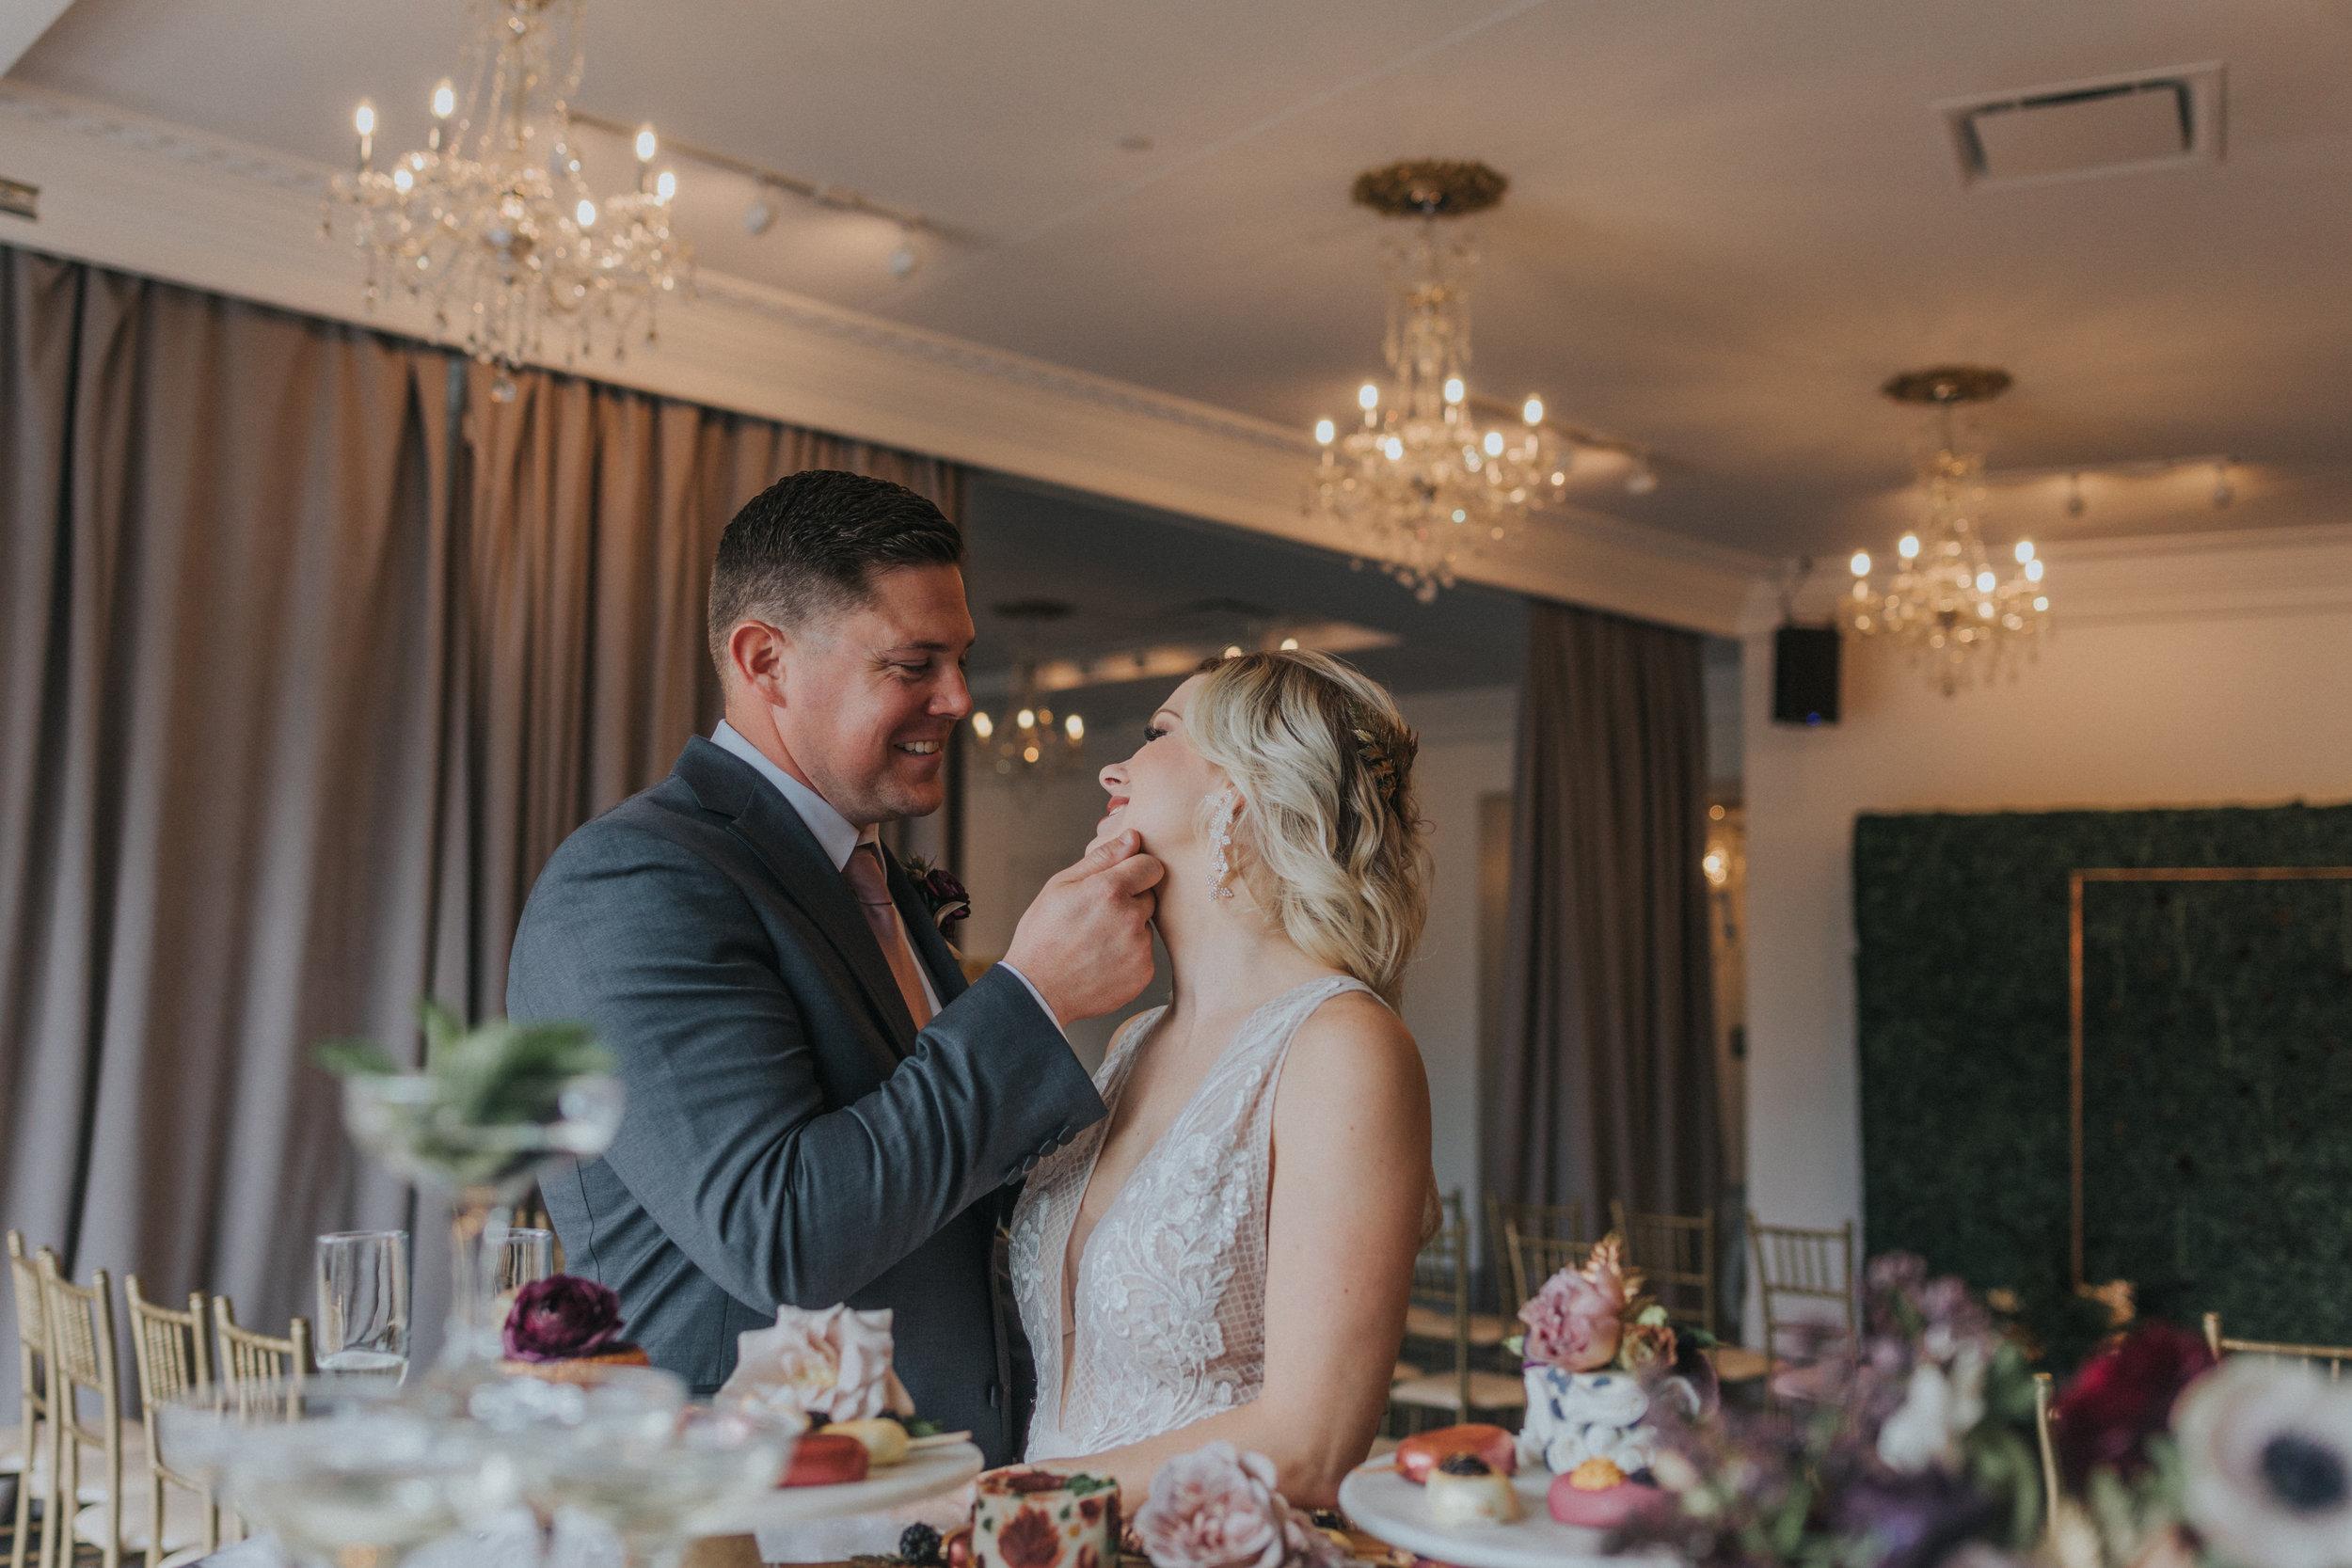 143 tiny-luxe-weddings-omaha-nebraska-midwest-empire-room.jpg